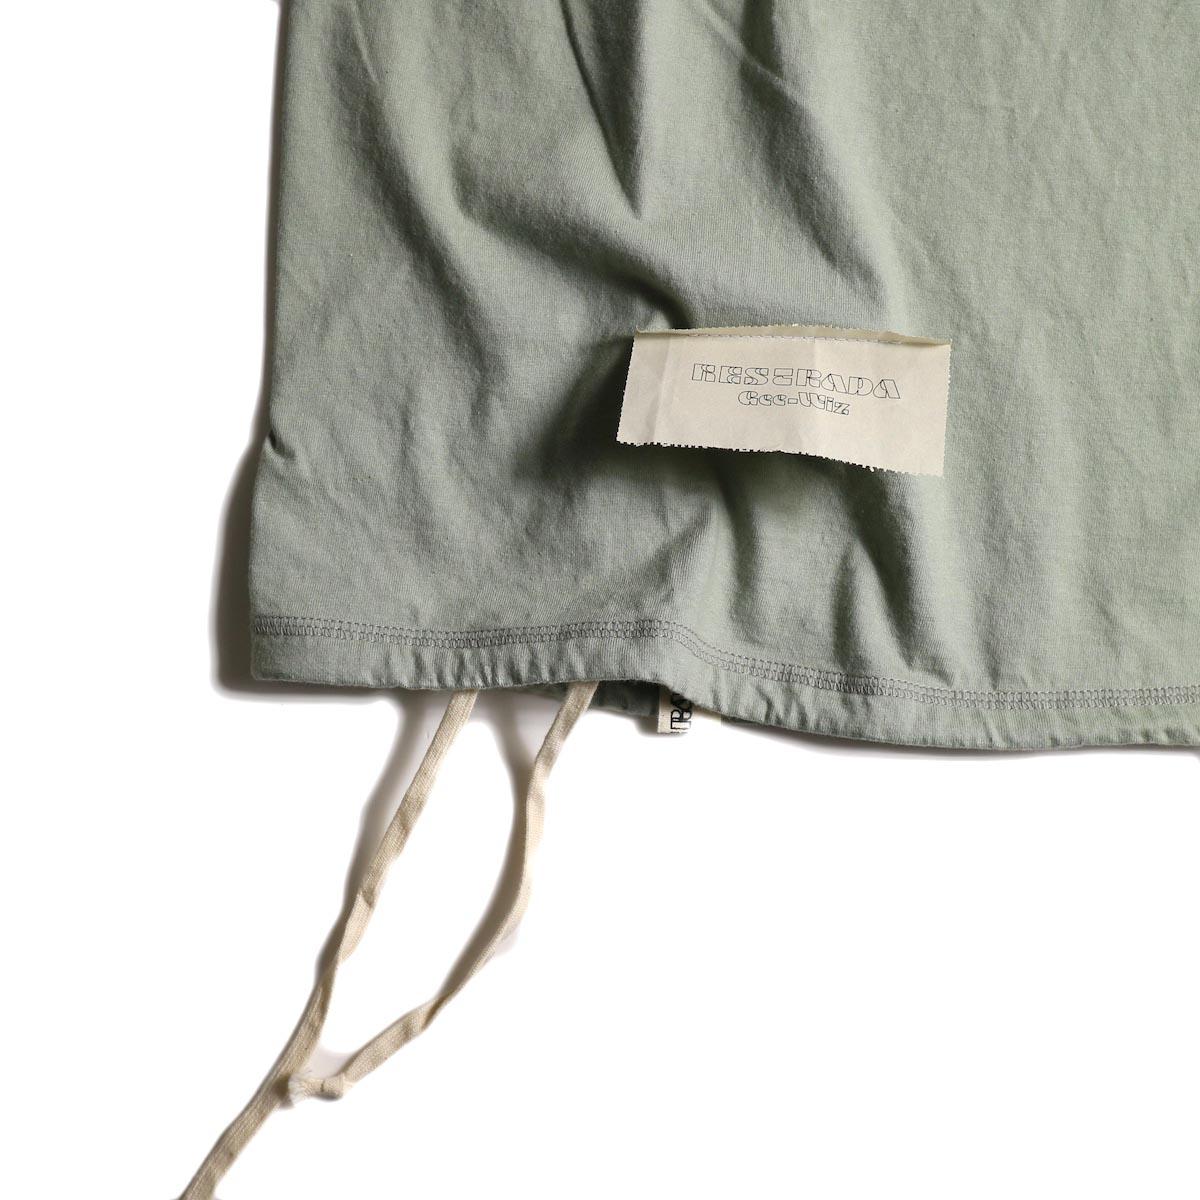 HESTRADA GEE-WIZ / SWITCH S/S Tee (Stone Green)裾、紙タグ